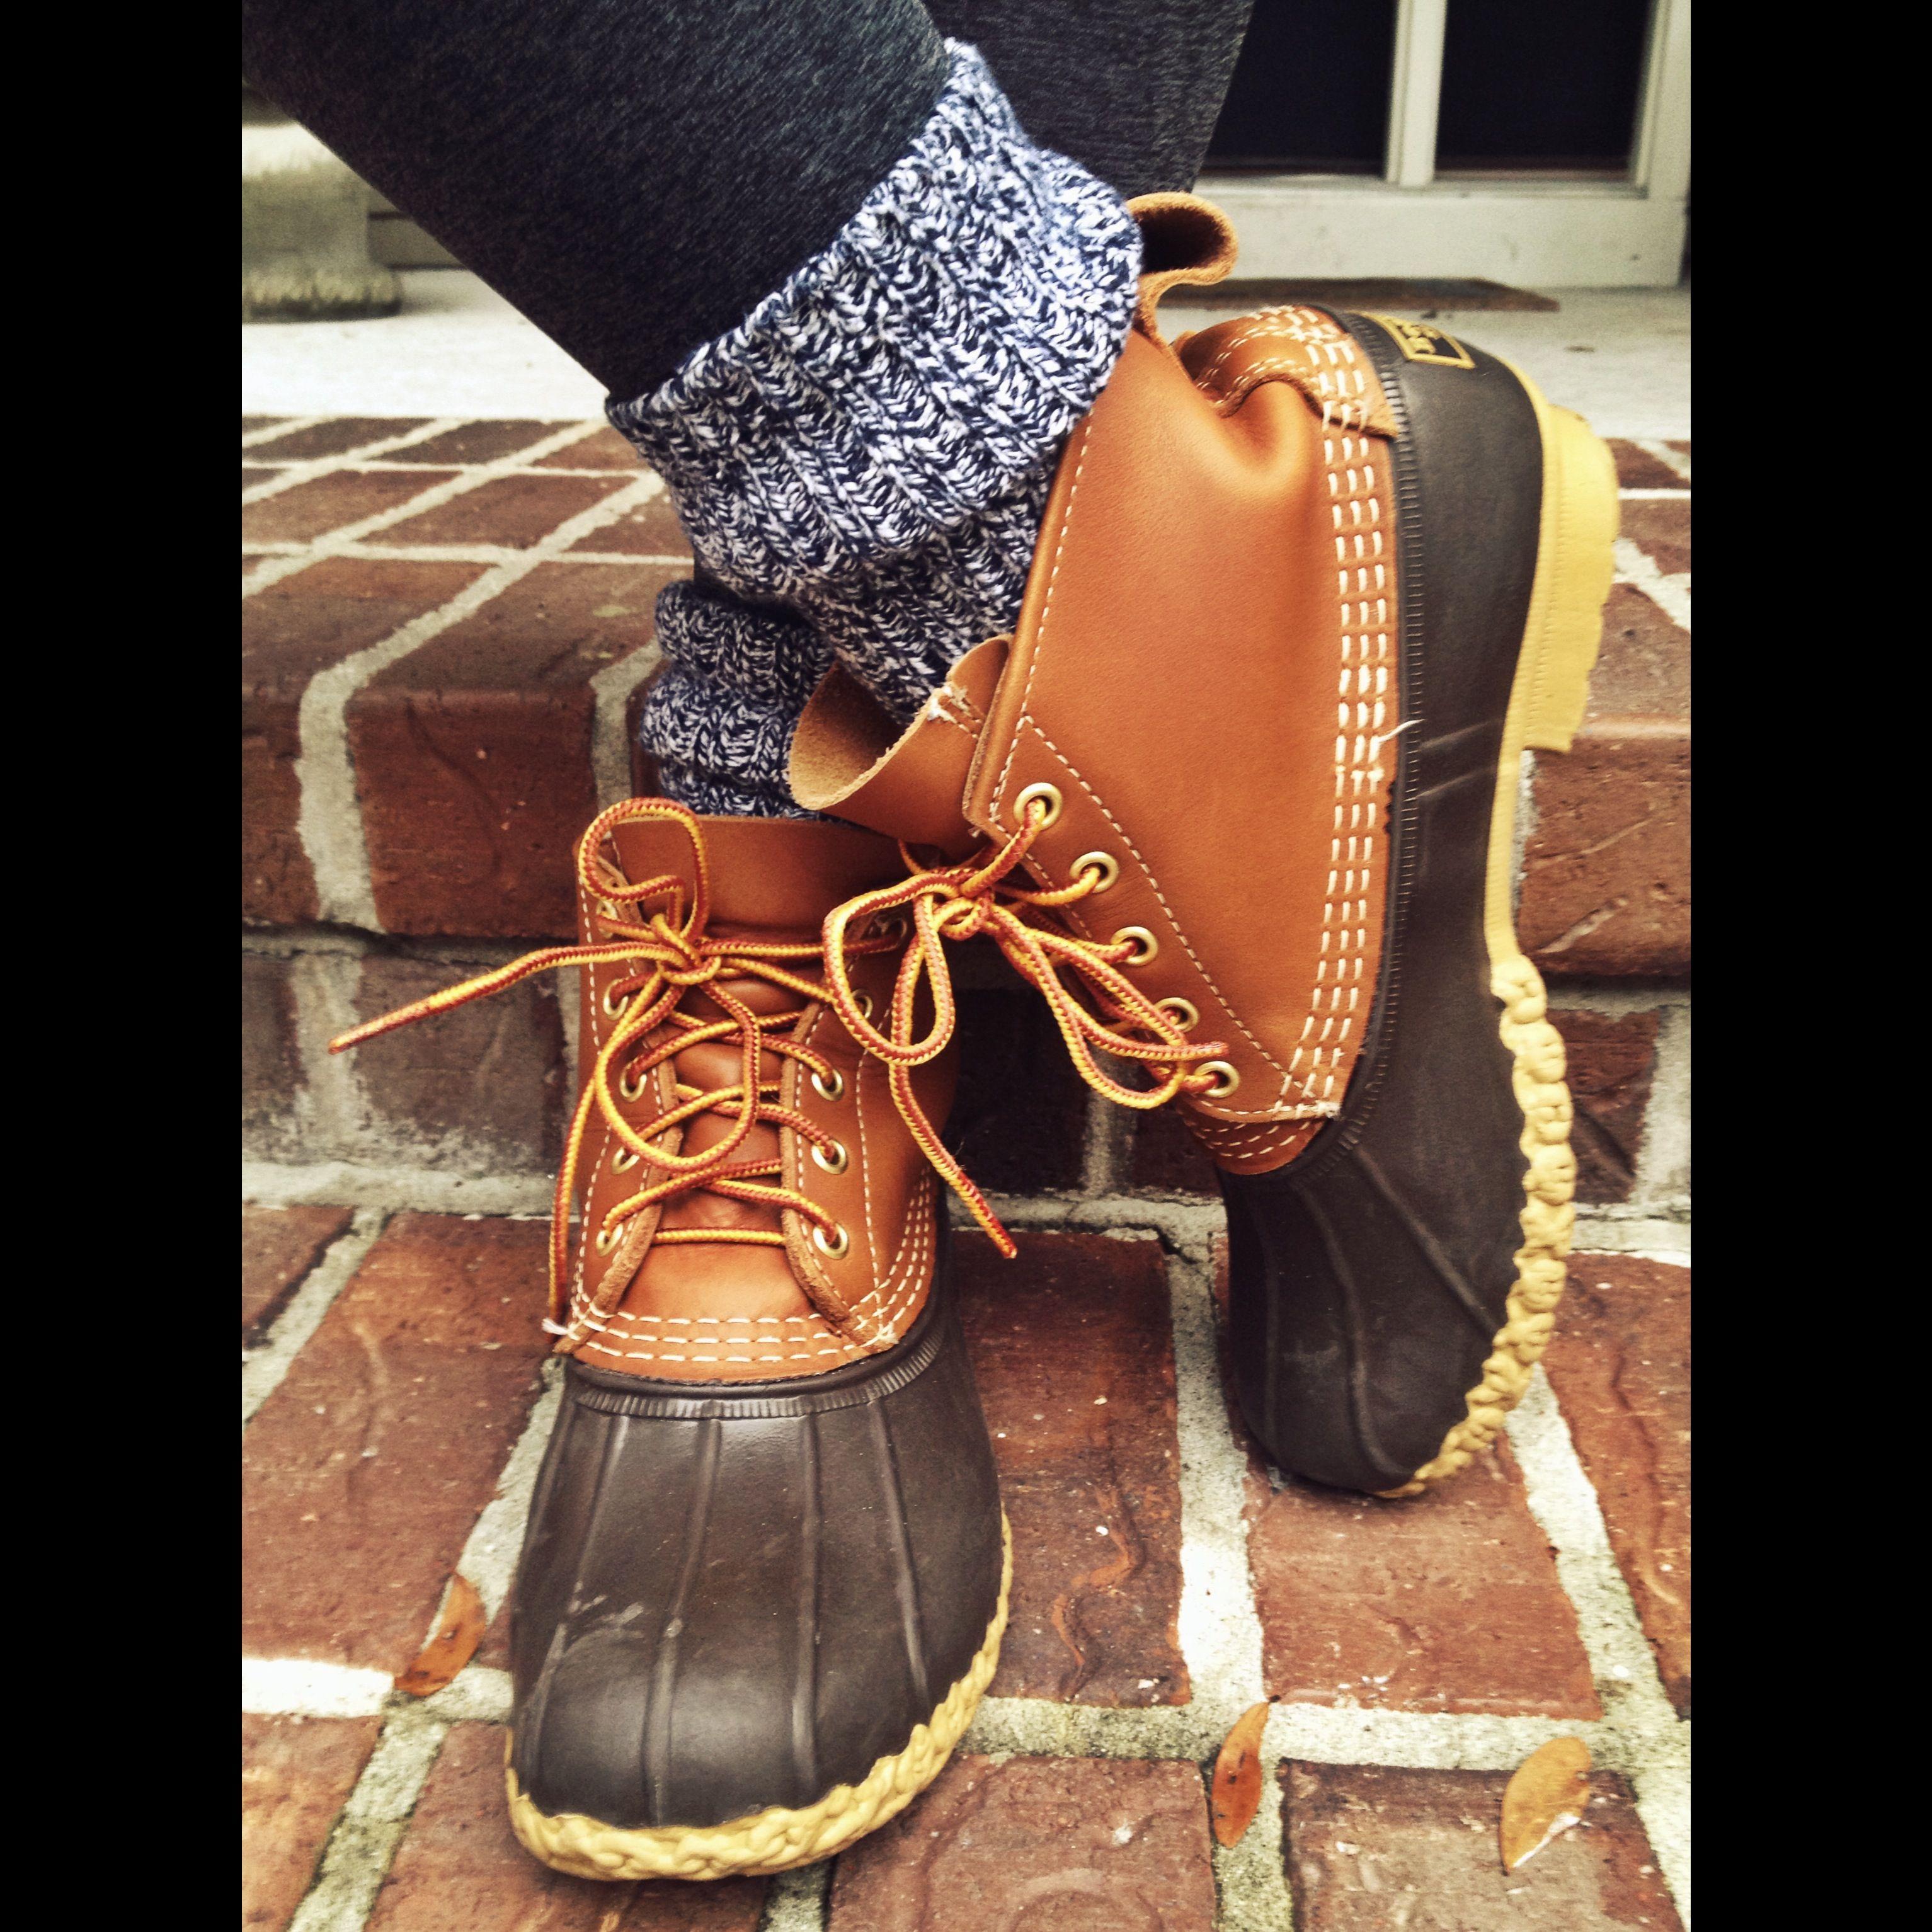 Ll bean duck boots preppy - photo#21